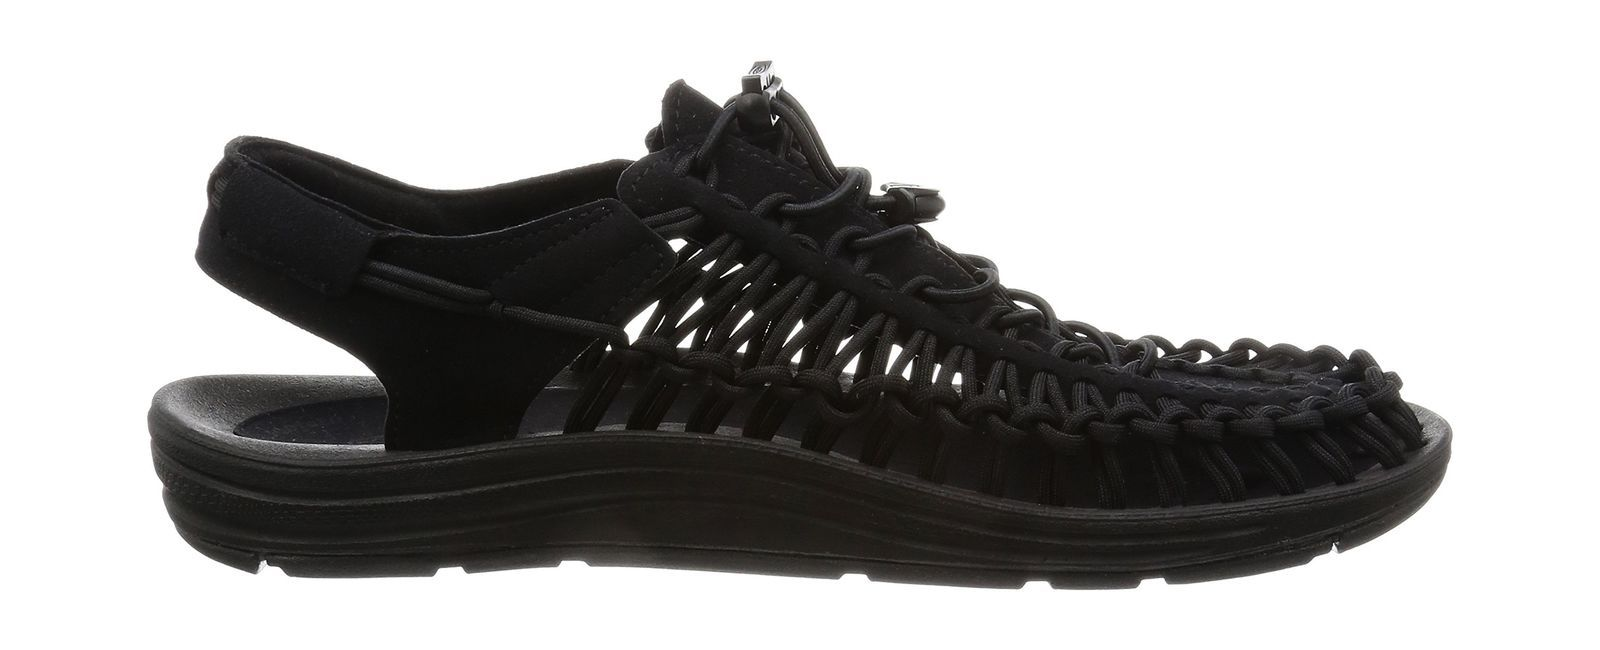 bc592c65aab9 Keen Mens Uneek Hiking Sandals Black (Black) and 50 similar items